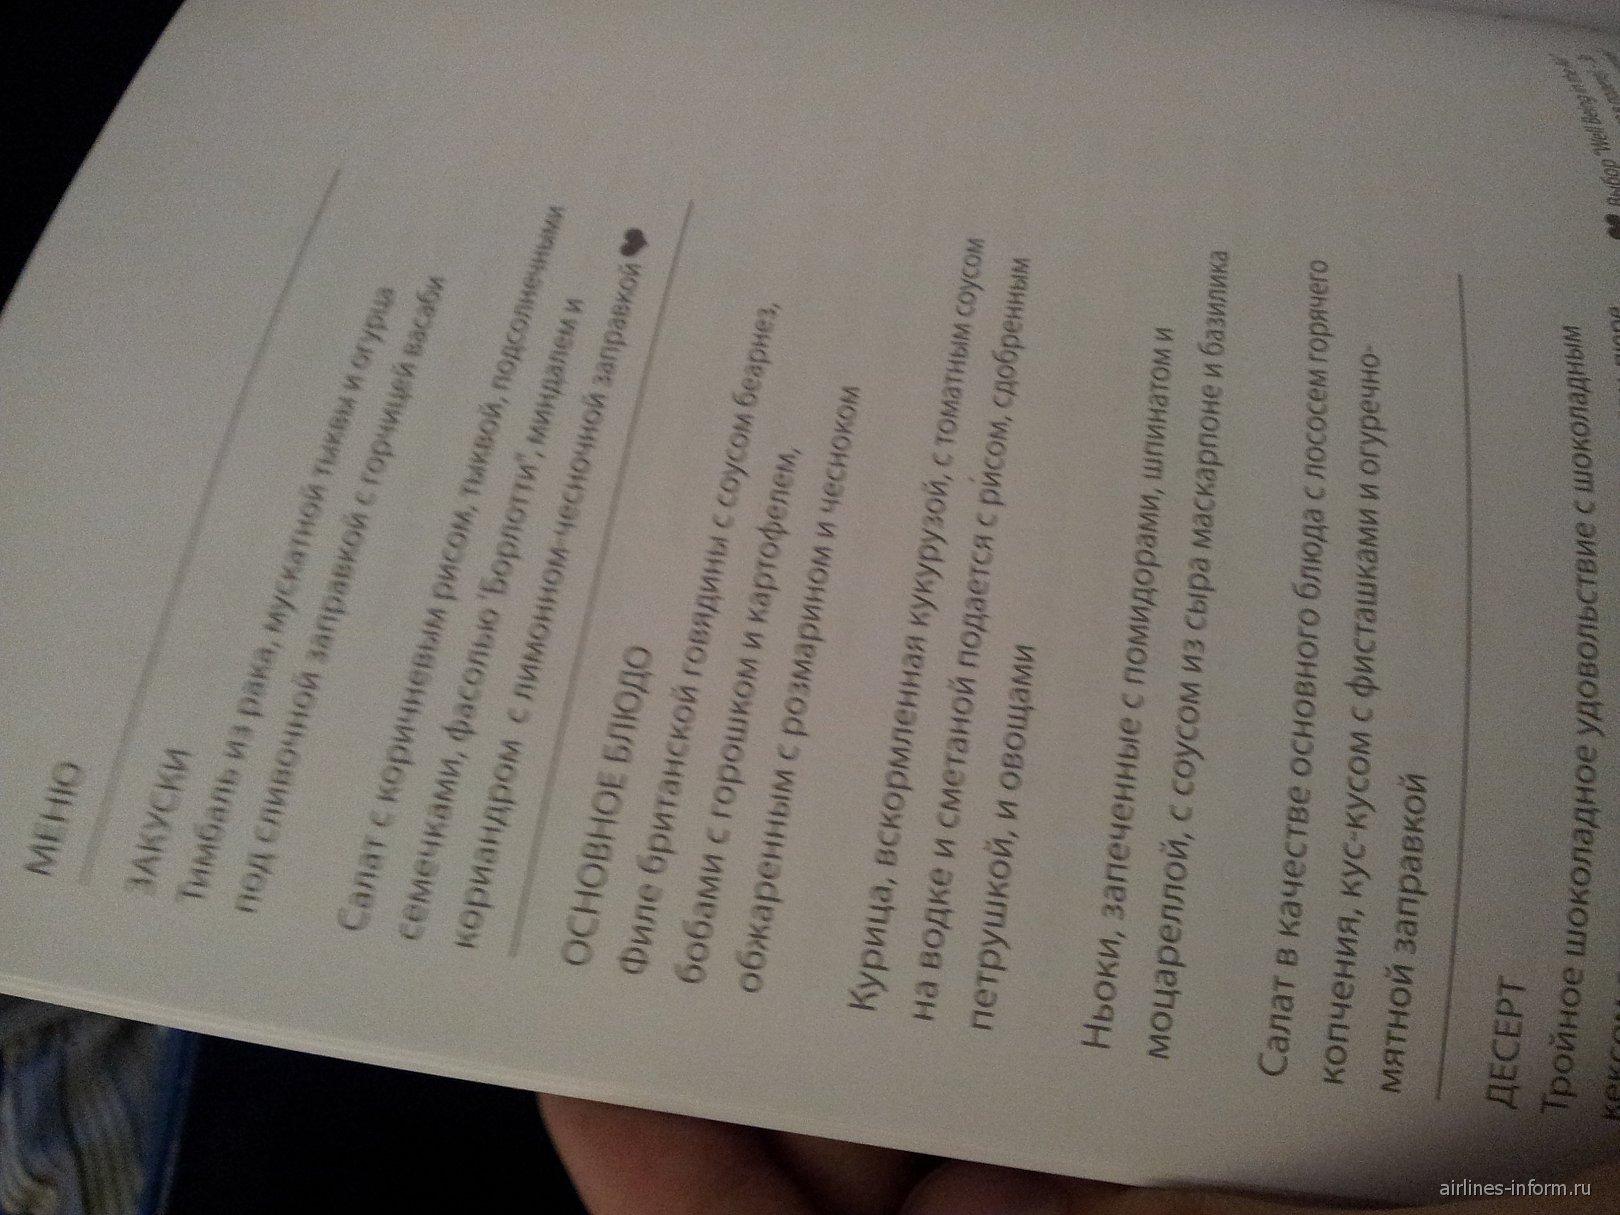 Меню на борту самолета Боинг-767-300 Британских авиалиний